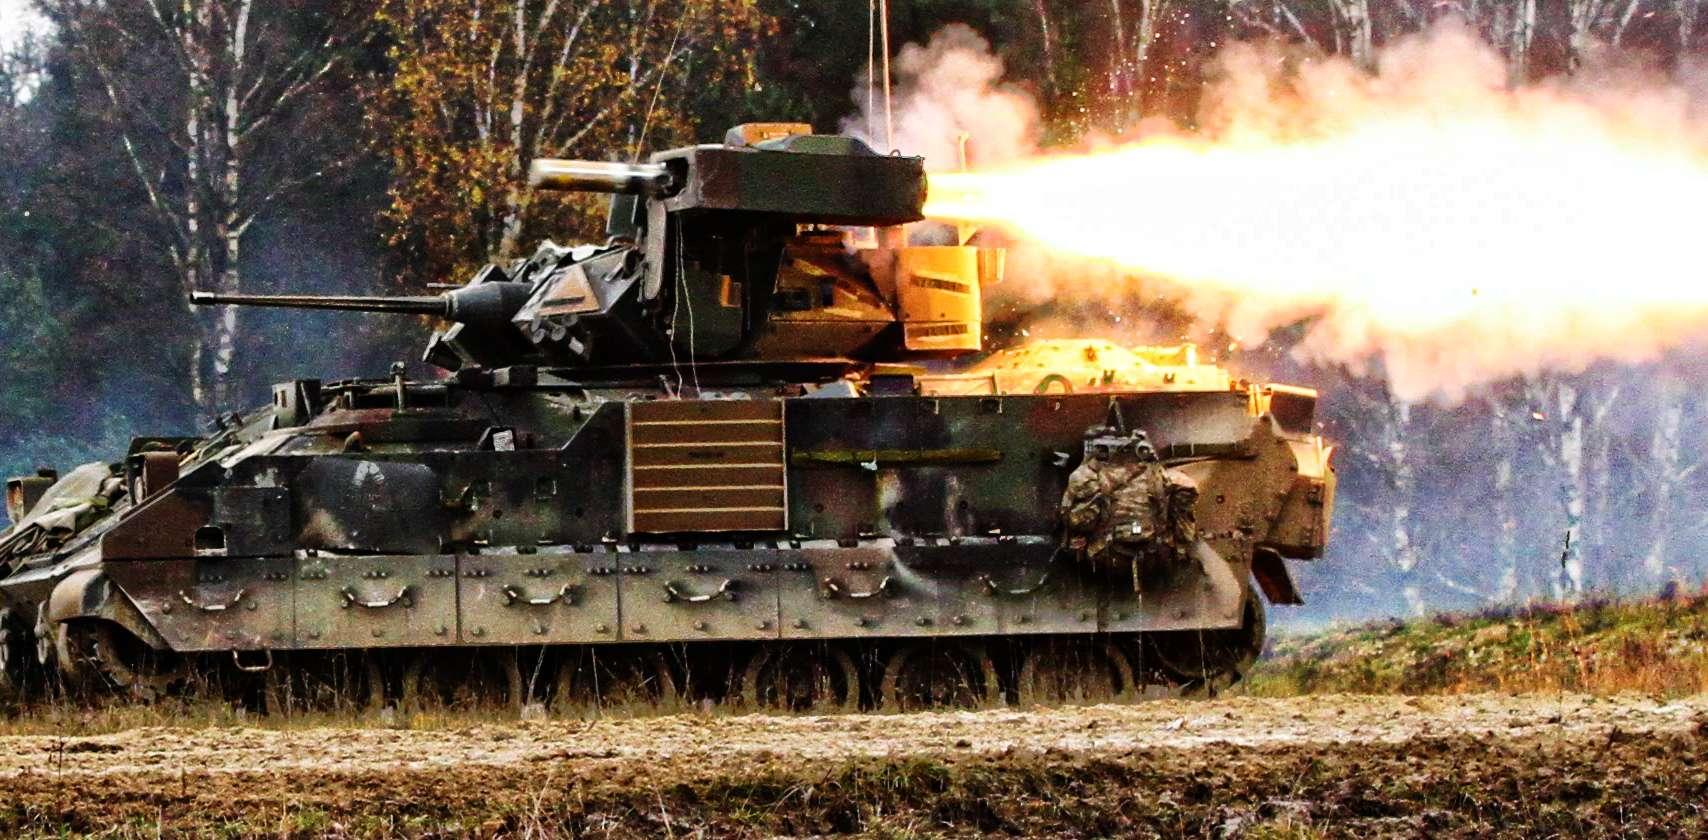 M2 Bradley firing TOW missile